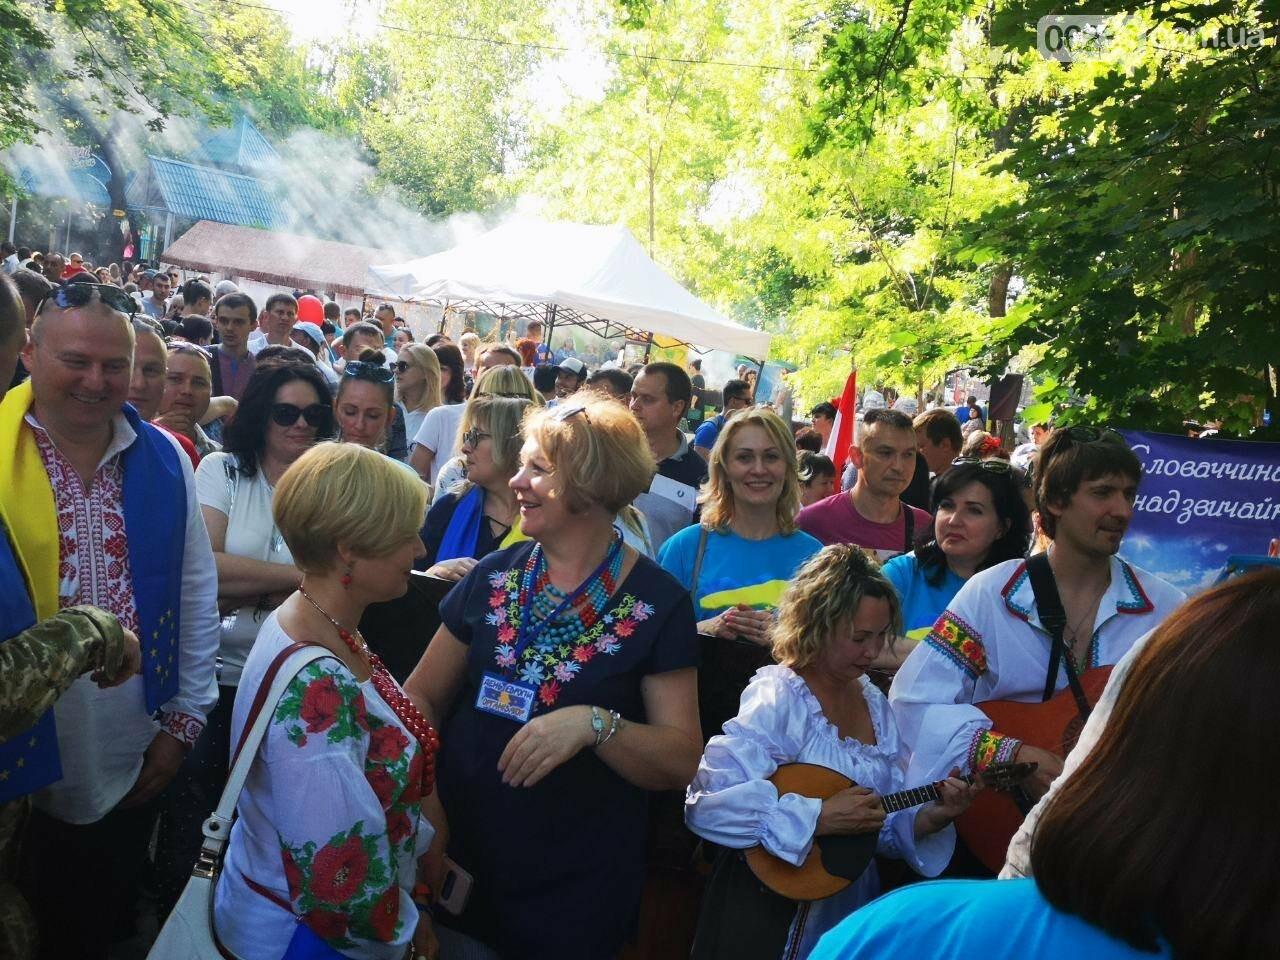 Авдеевка блистала на фестивале ко Дню Европы в Бахмуте (ФОТО/ВИДЕО)   , фото-6